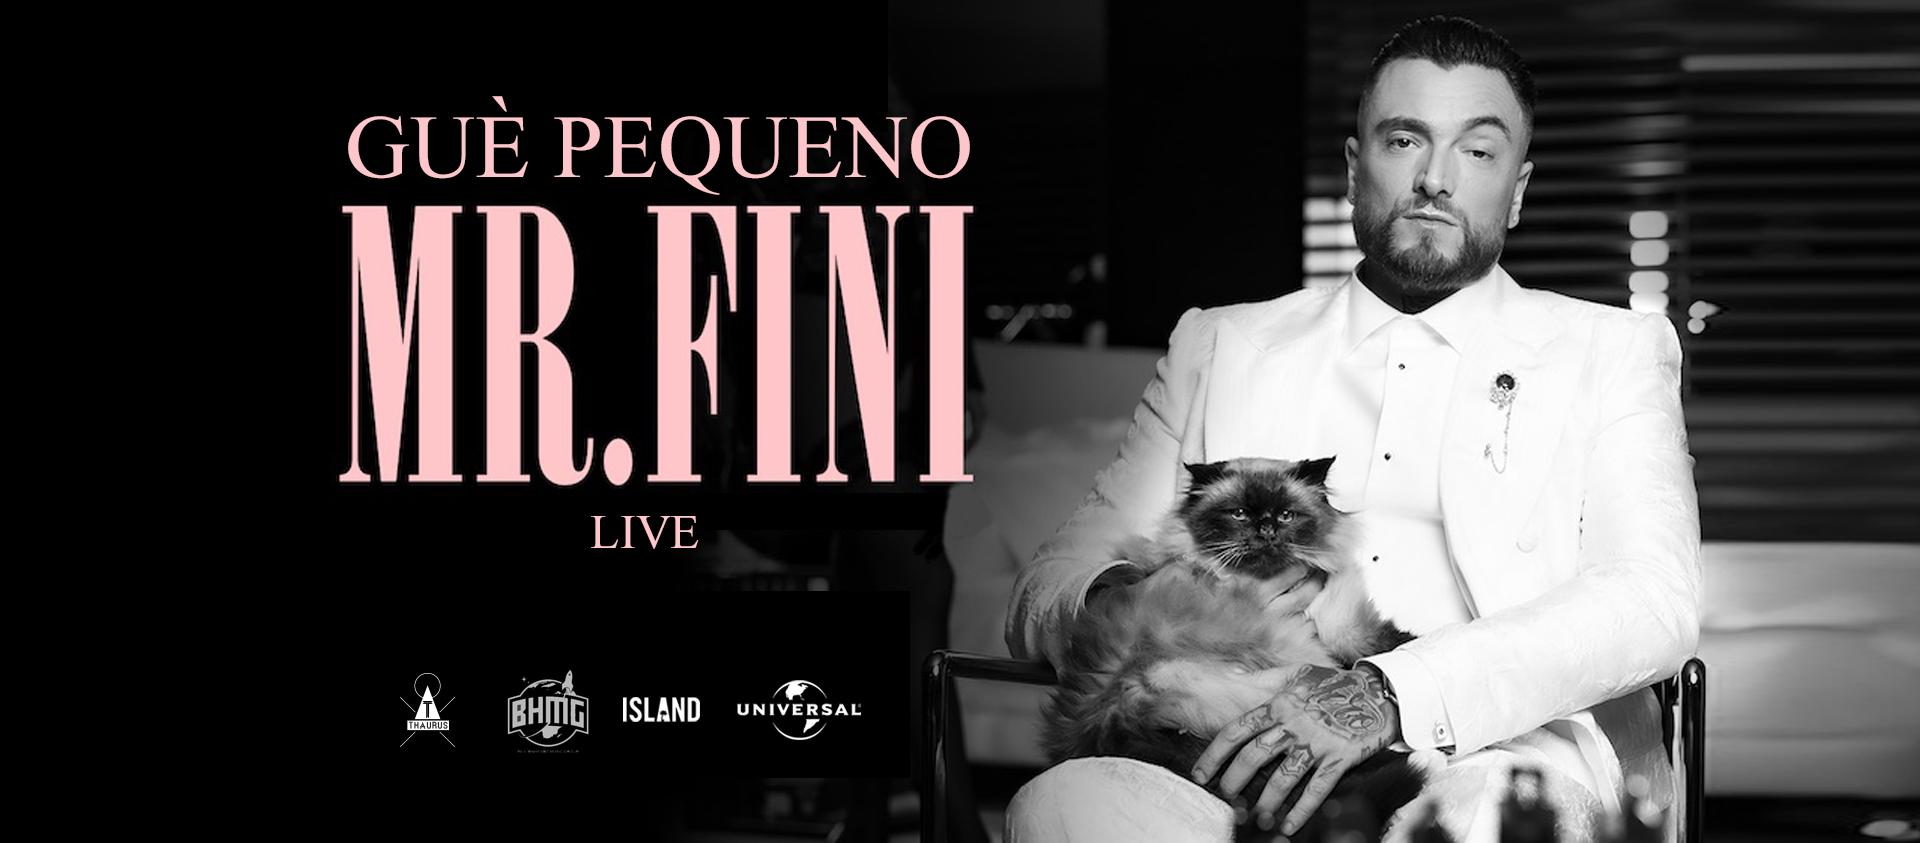 GUÈ PEQUENO - MR FINI LIVE 2021